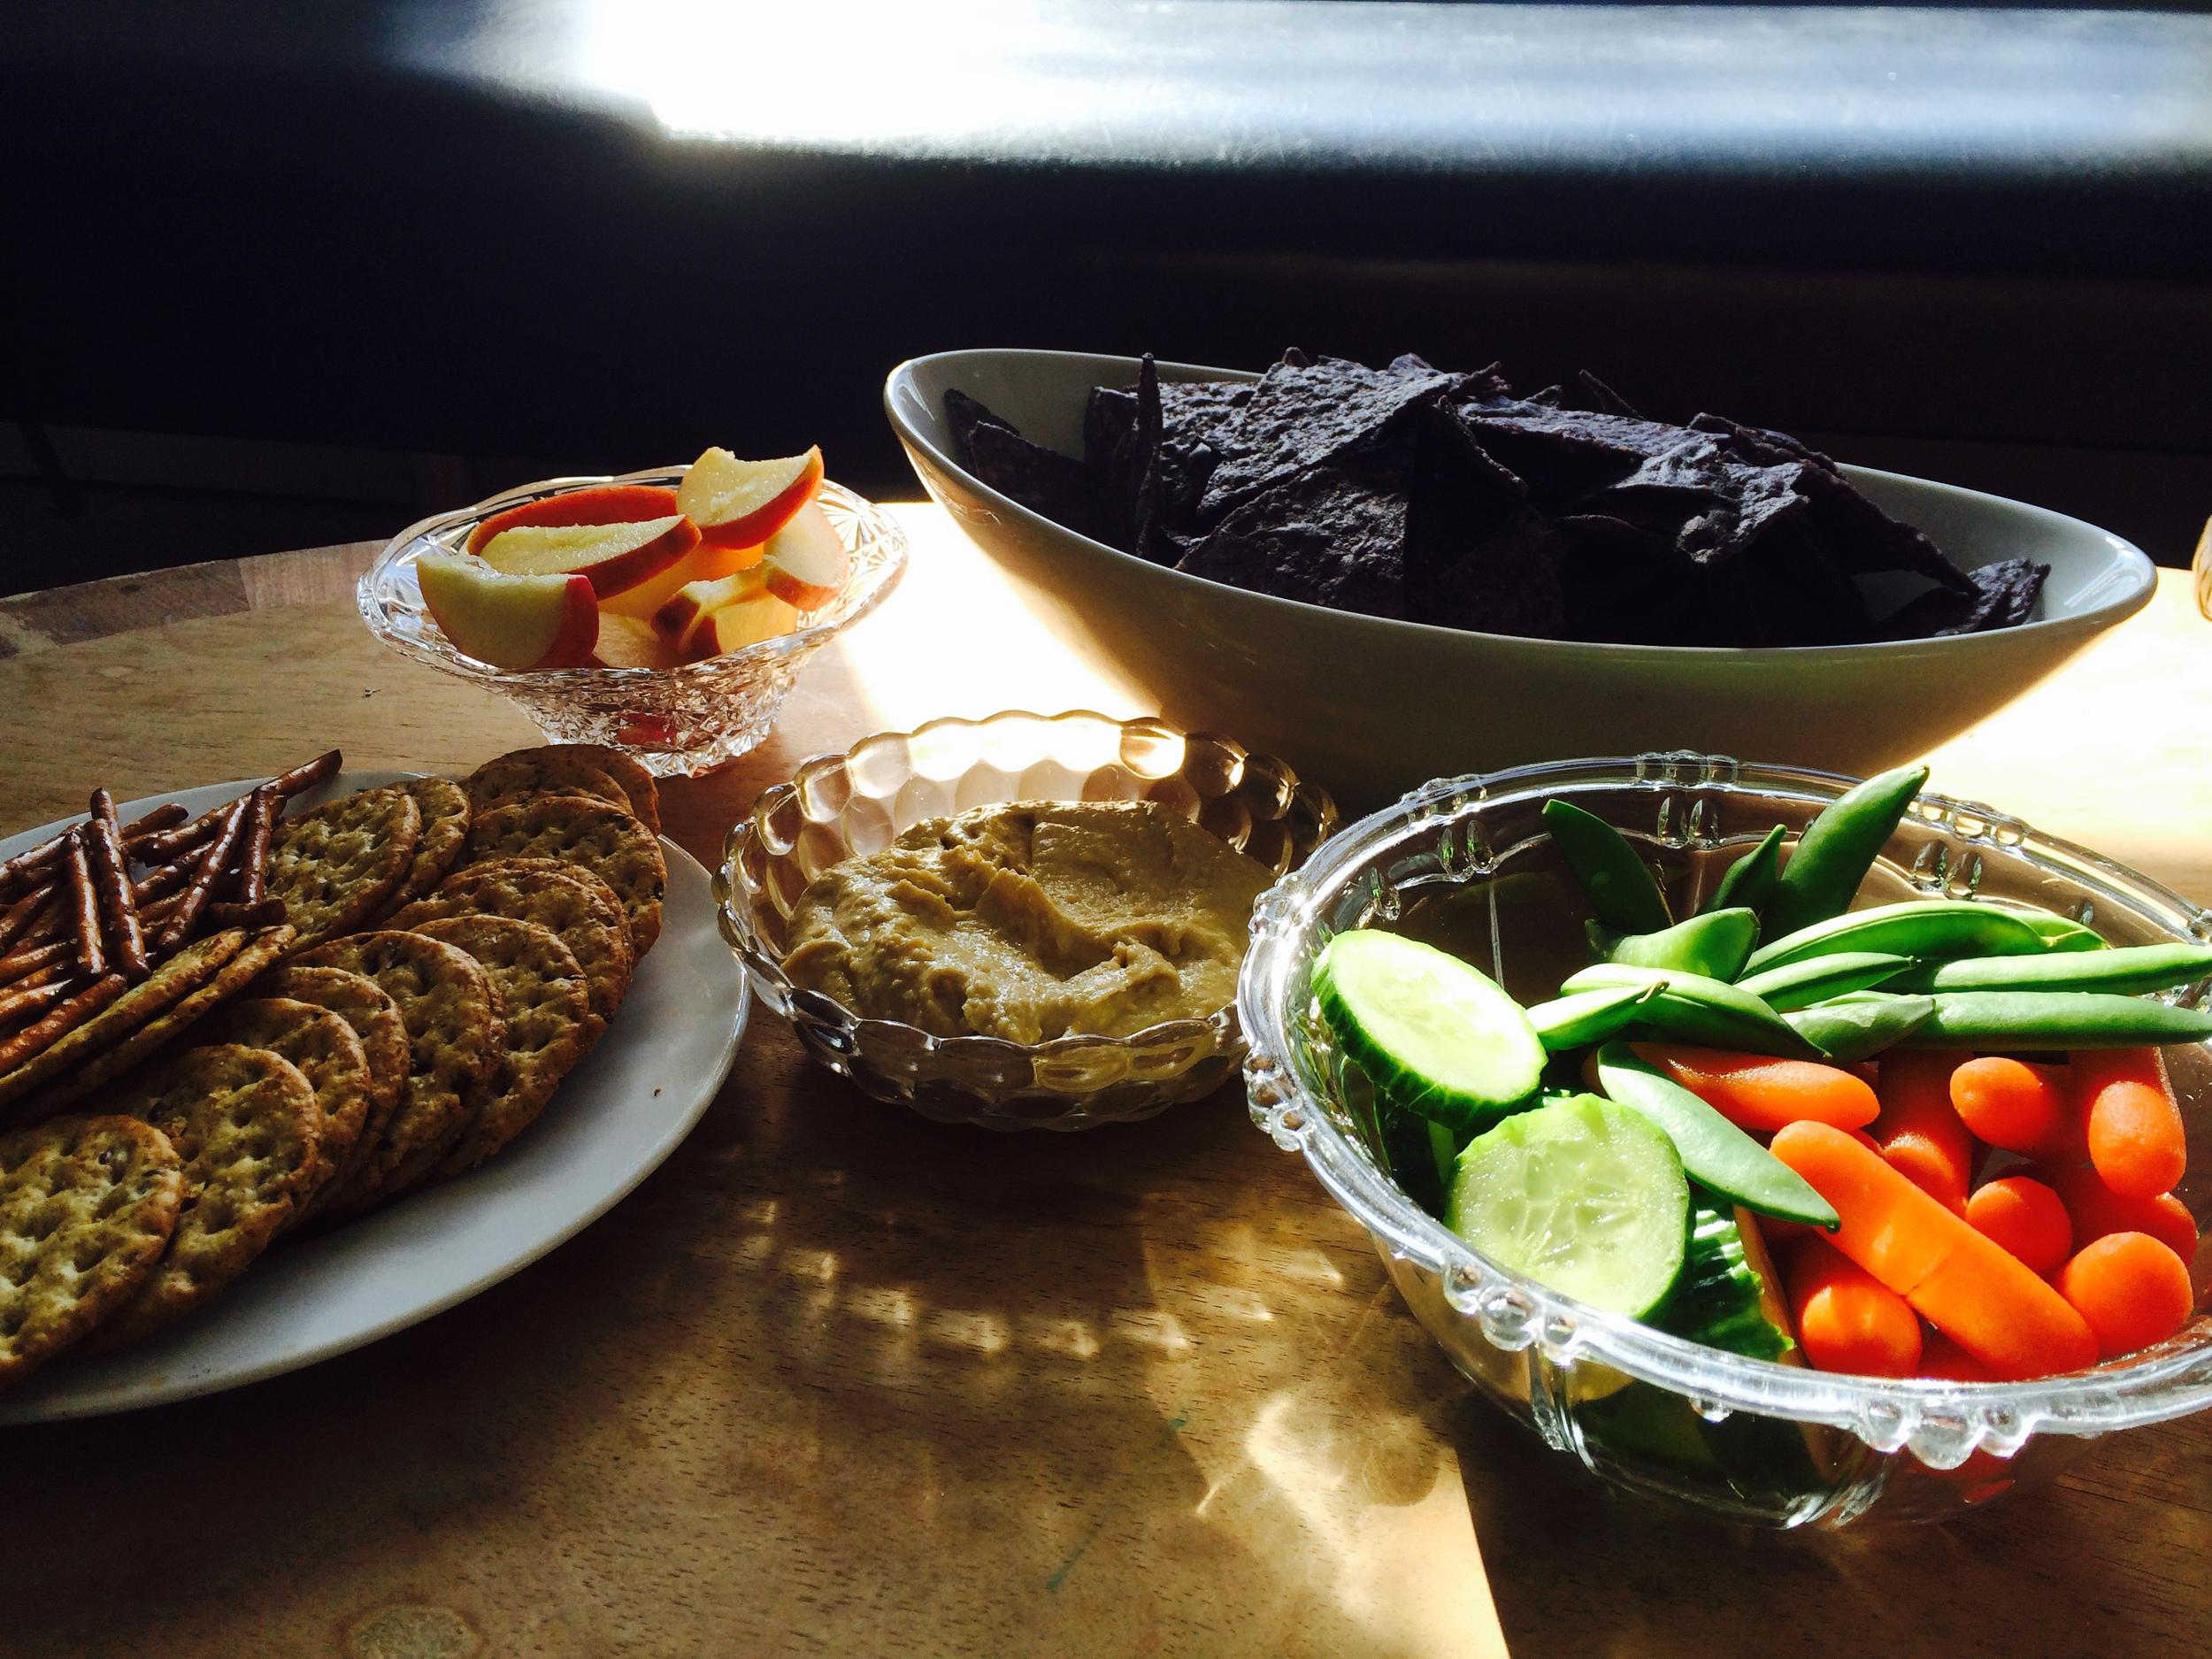 Mmmm - fresh veggies, snacks, VG and GF treats too!